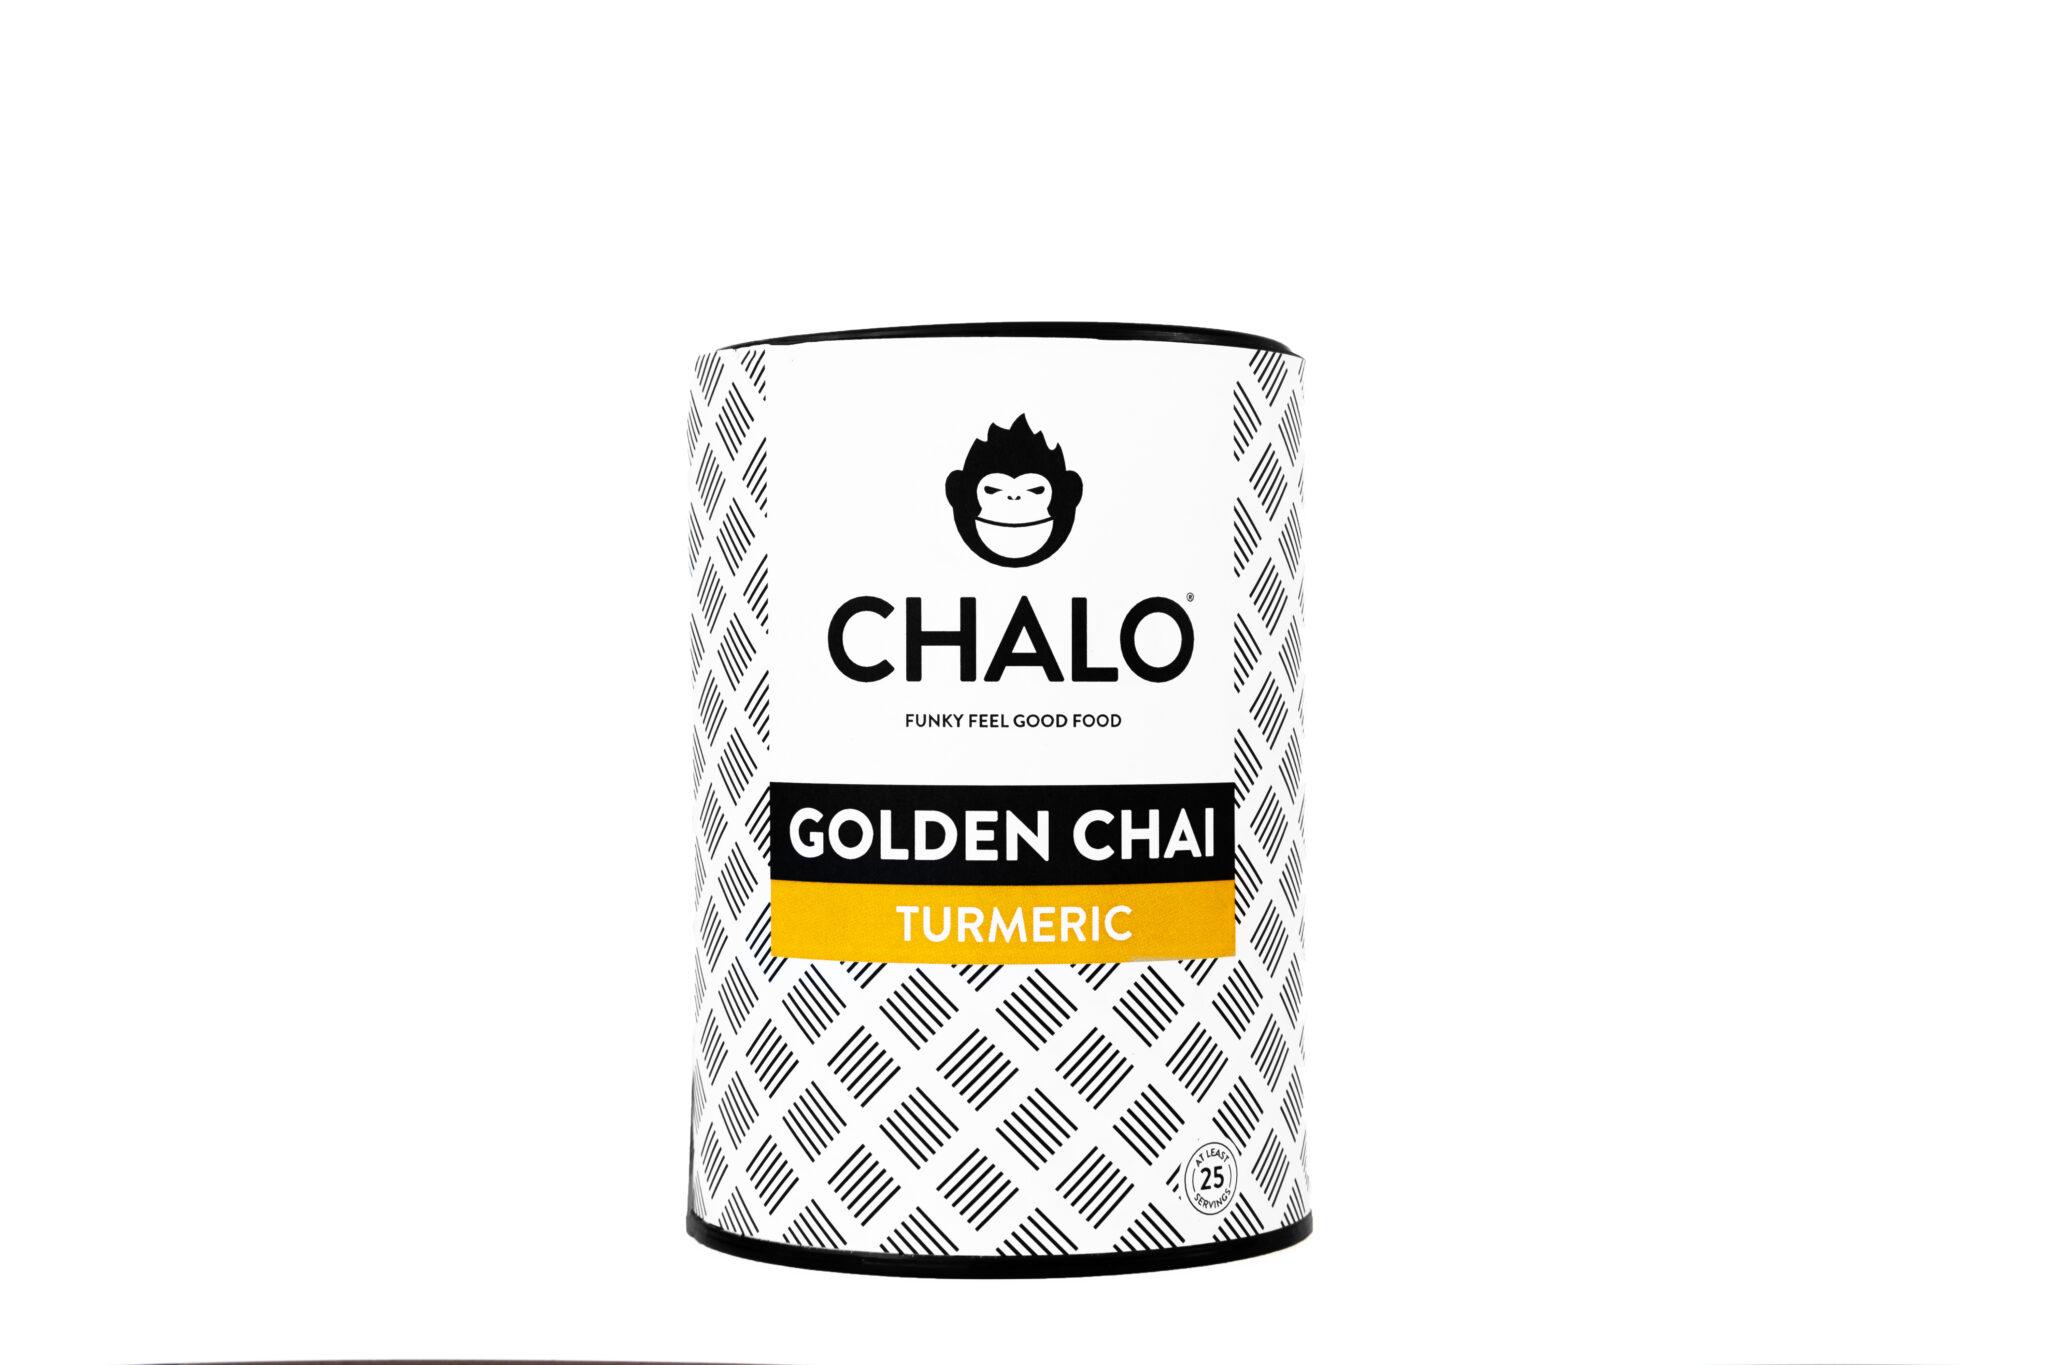 CHALO Golden Turmeric Chai